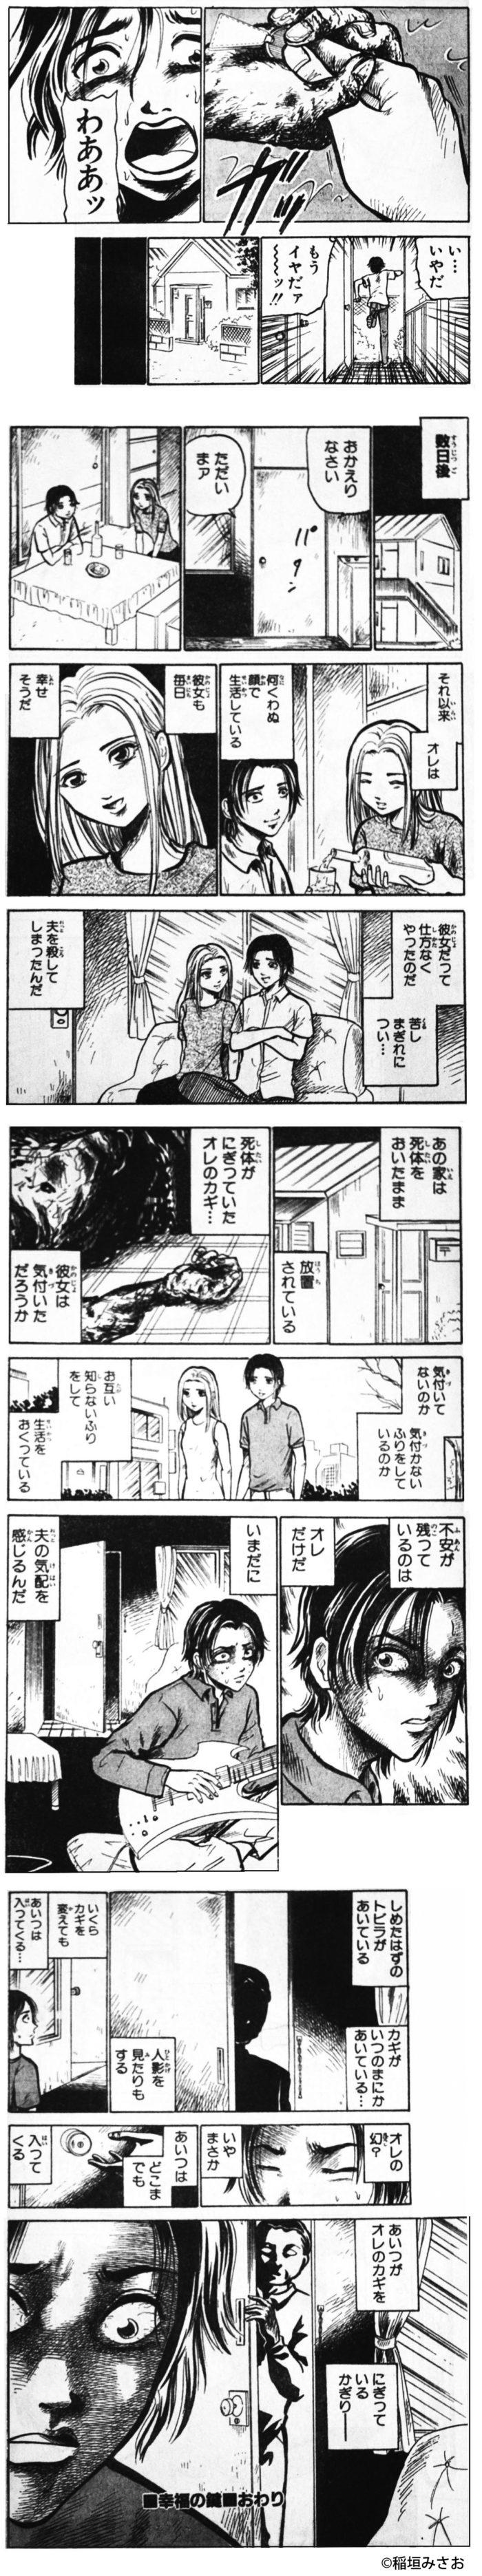 koufukuno-kagi2-06